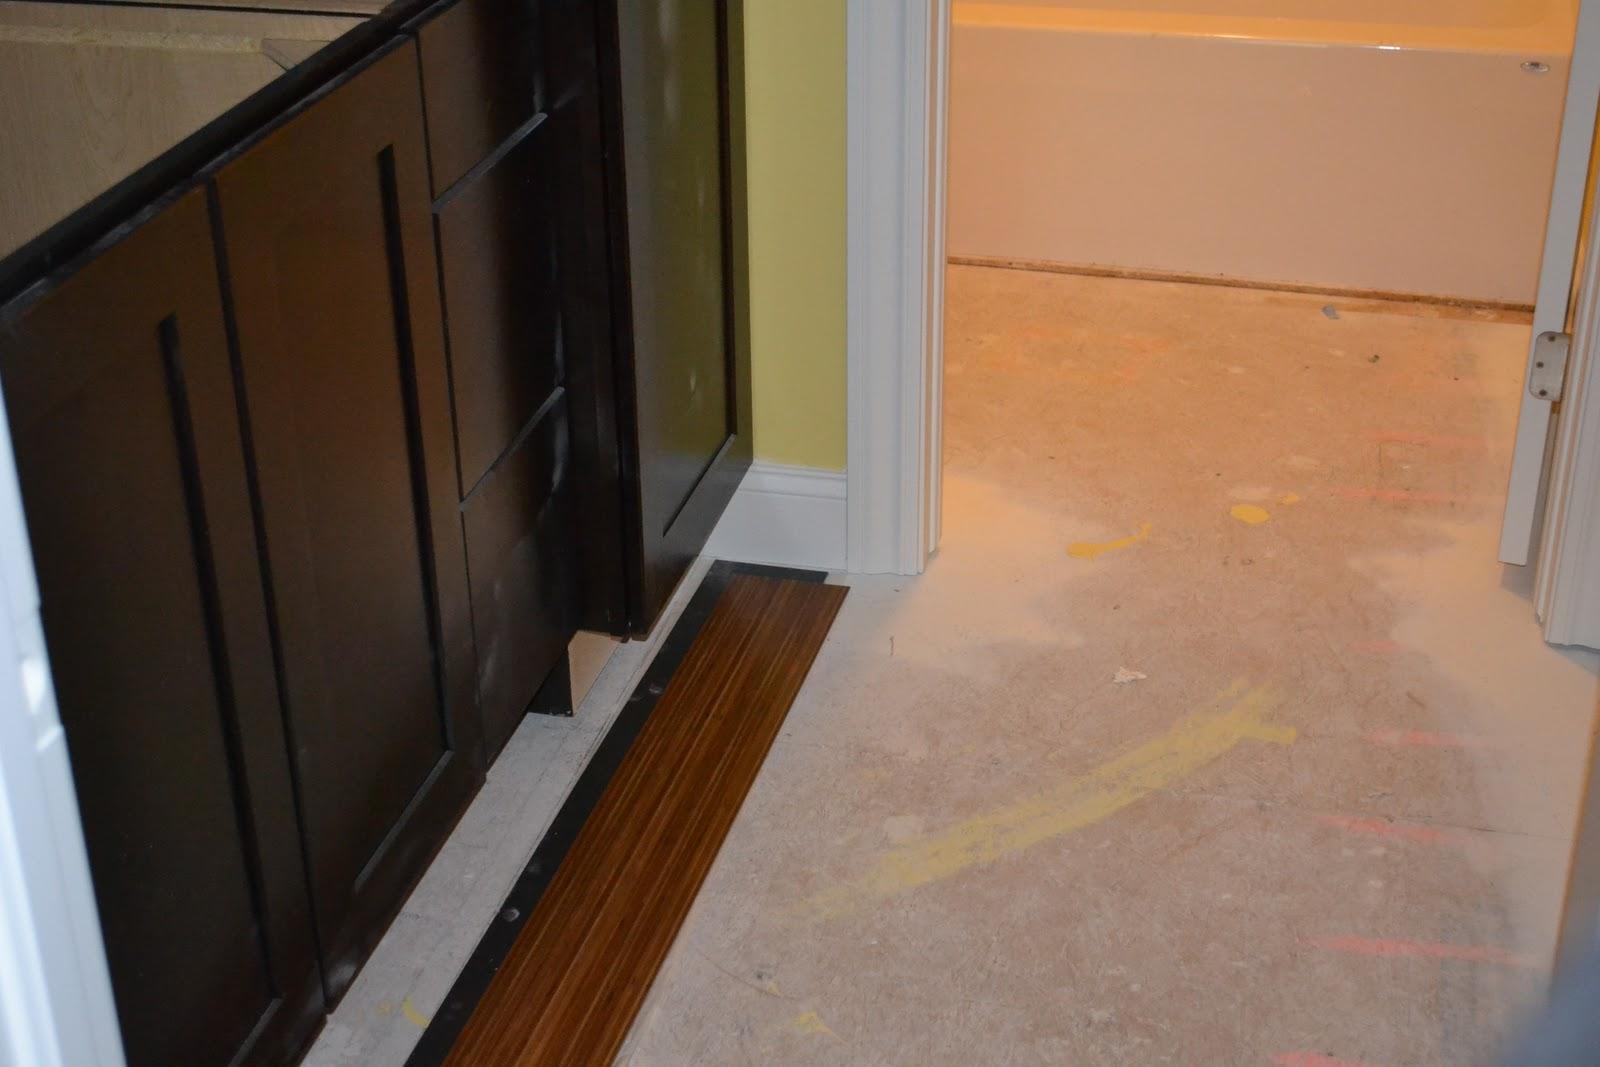 Lighting Basement Washroom Stairs: De Jong Dream House: Up Next: Flooring